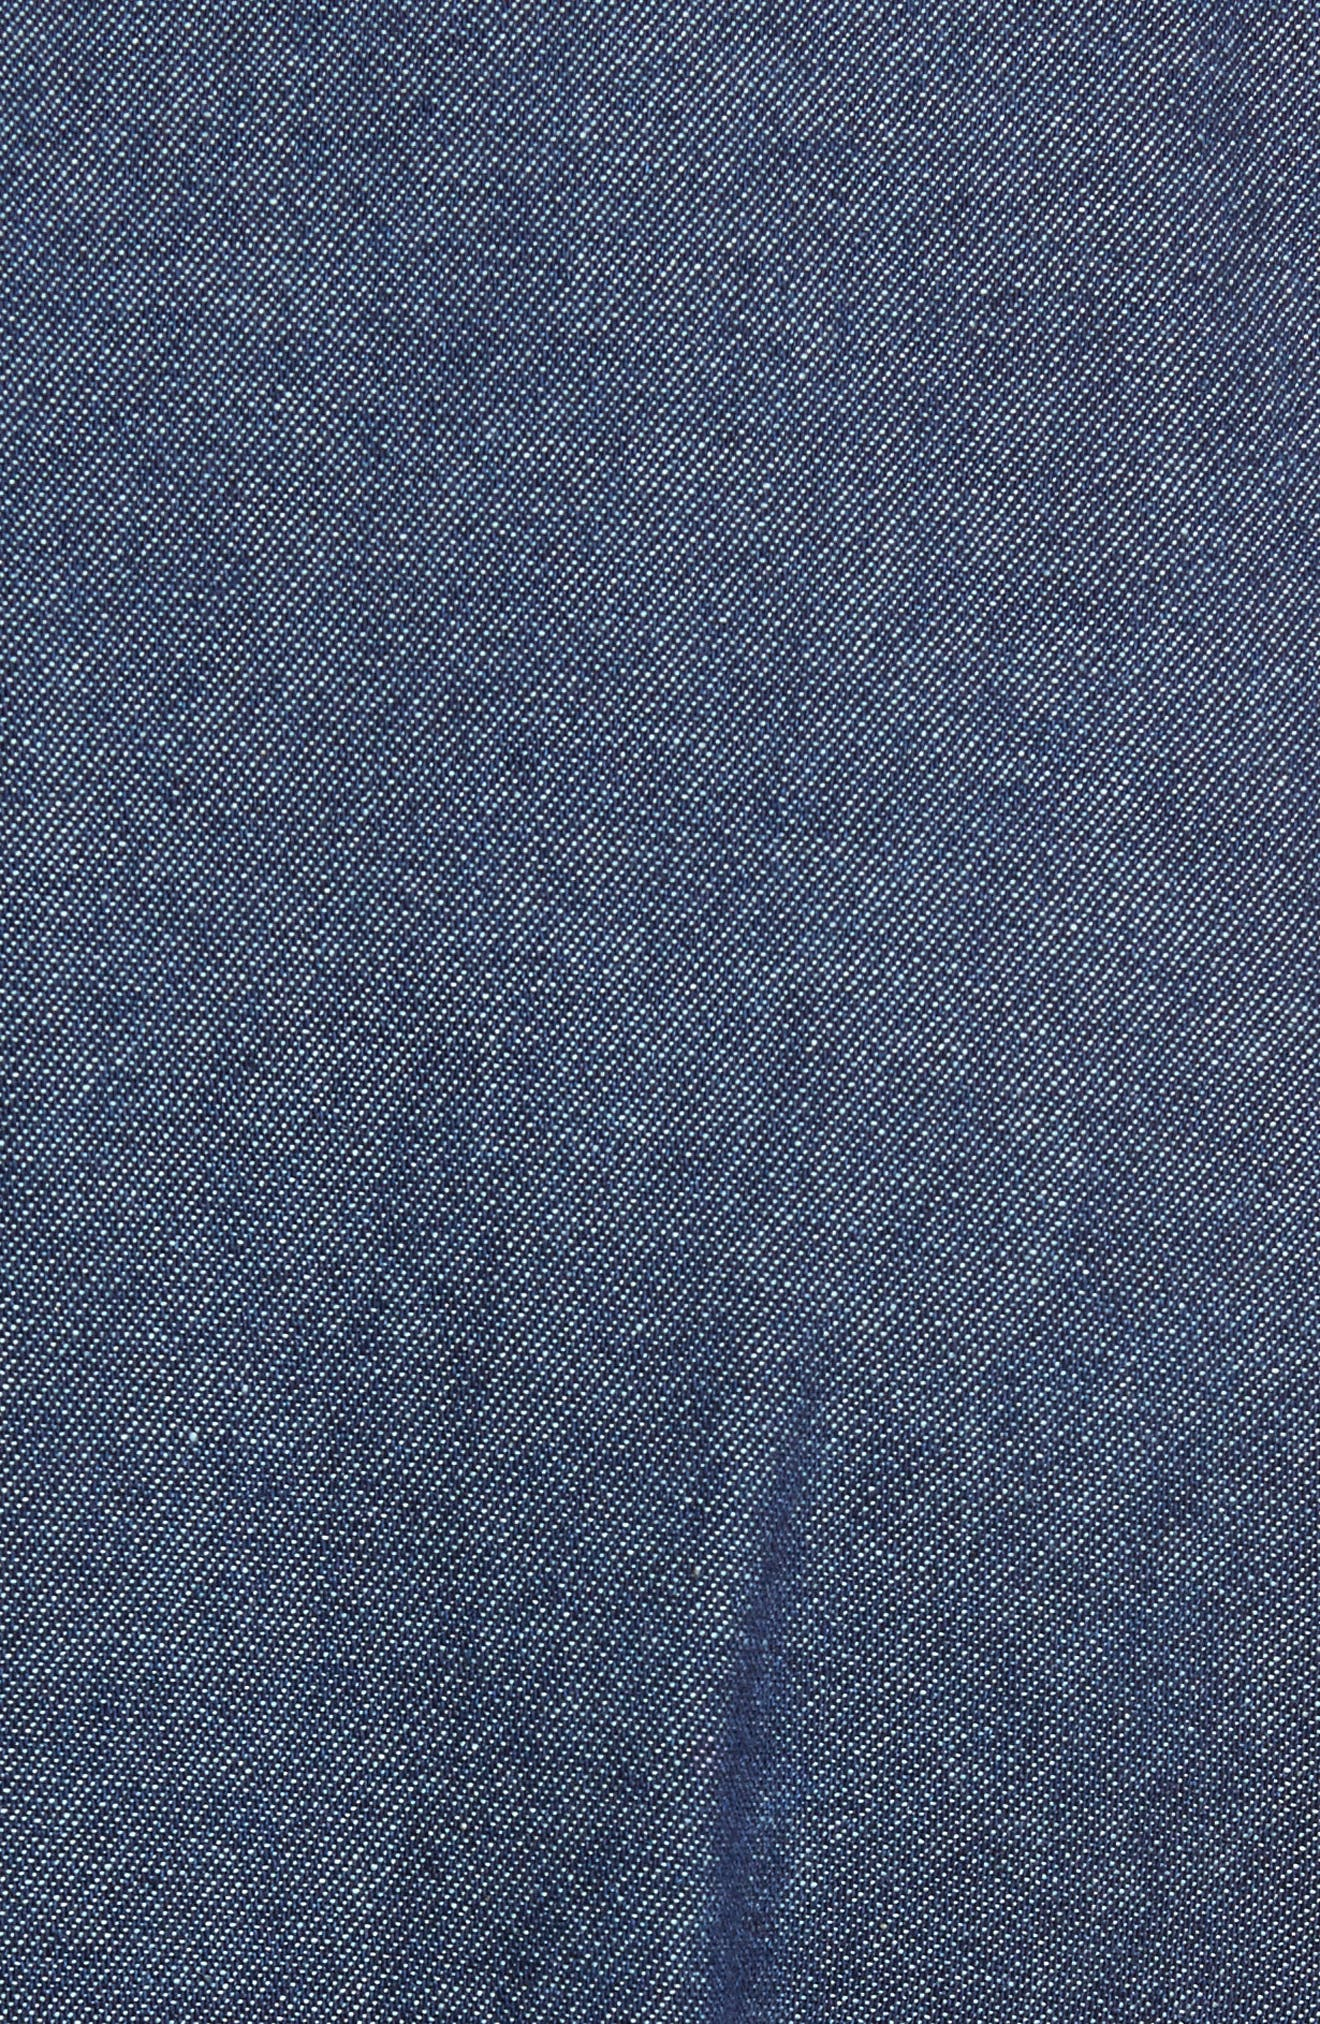 Indigo Long Sleeve Shirt,                             Alternate thumbnail 5, color,                             Indigo